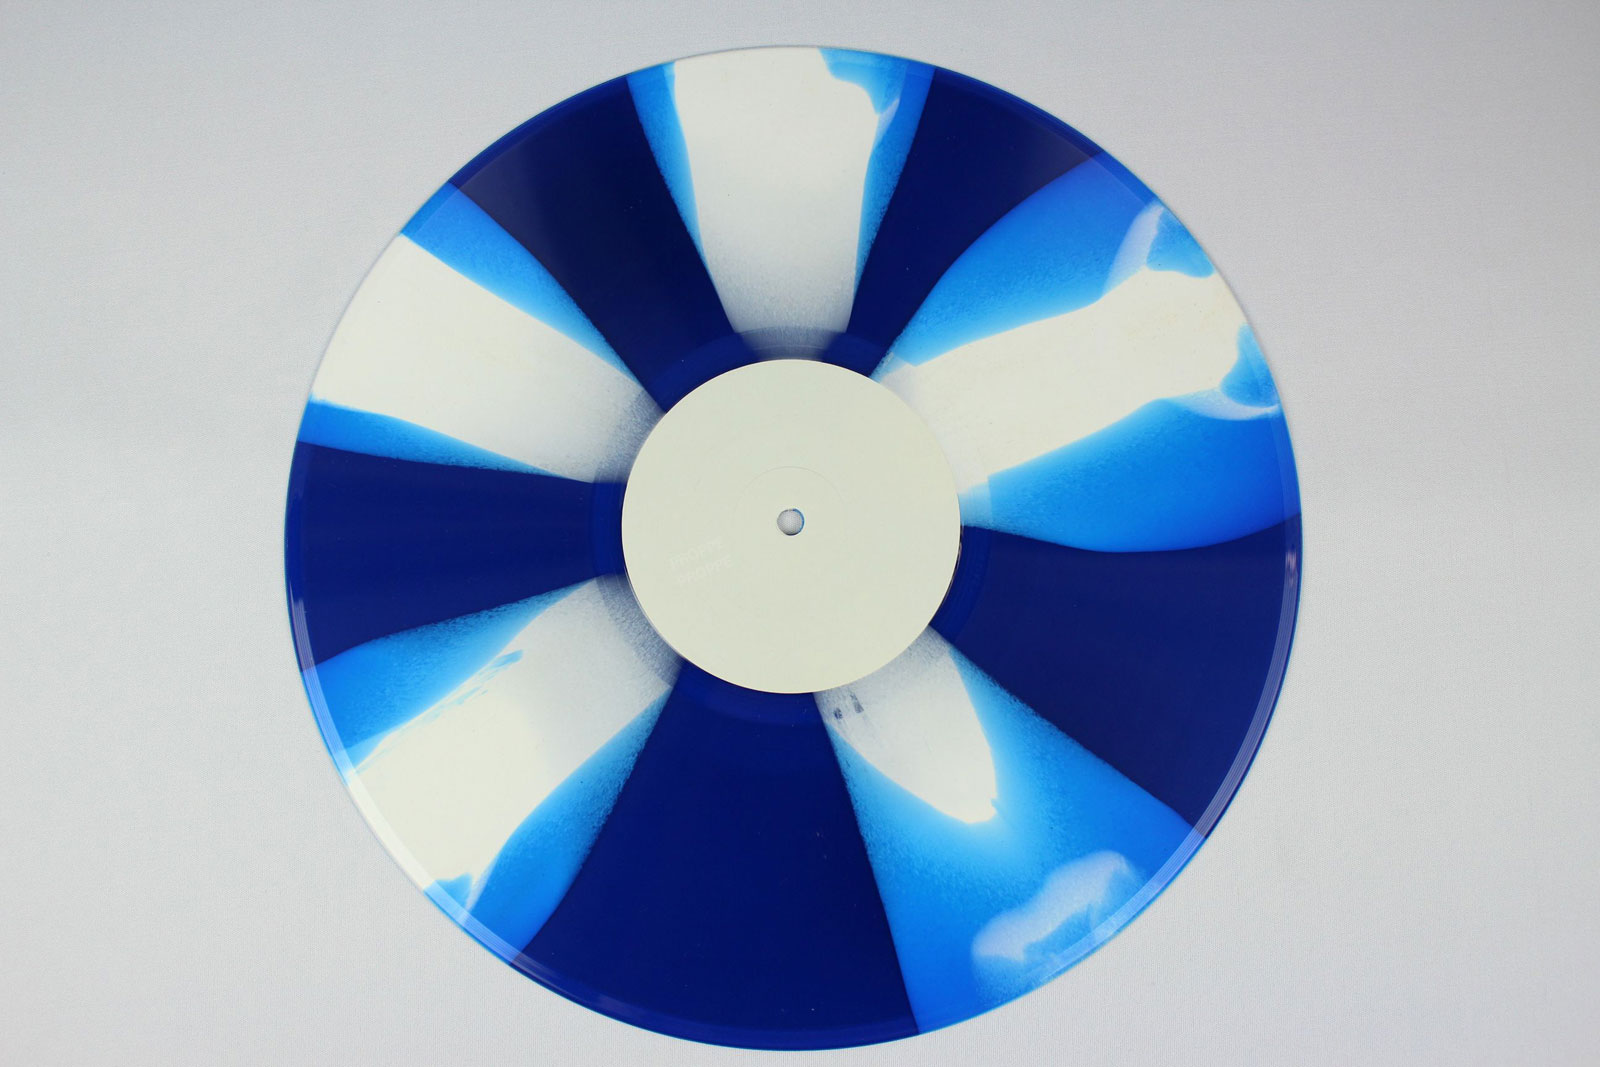 blue / coloured dab: 70% white + 30% clear